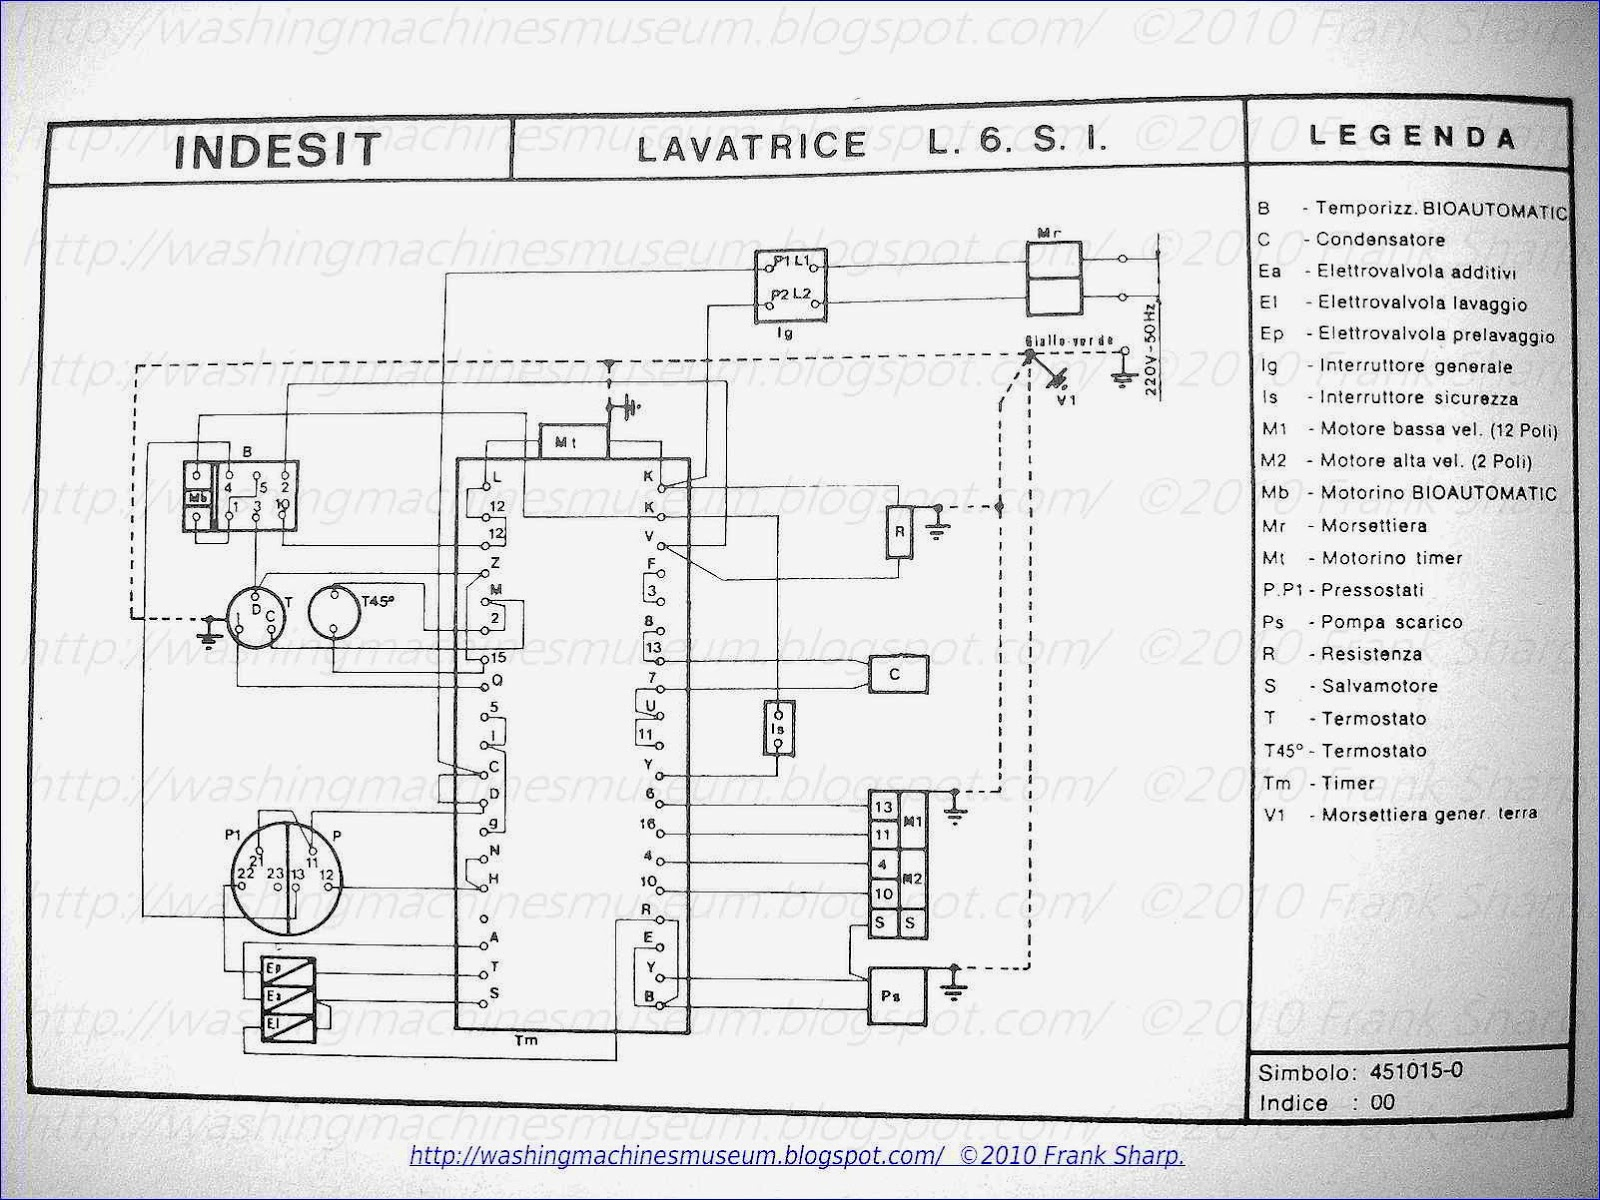 defy automaid washing machine wiring diagram [ 1600 x 1200 Pixel ]